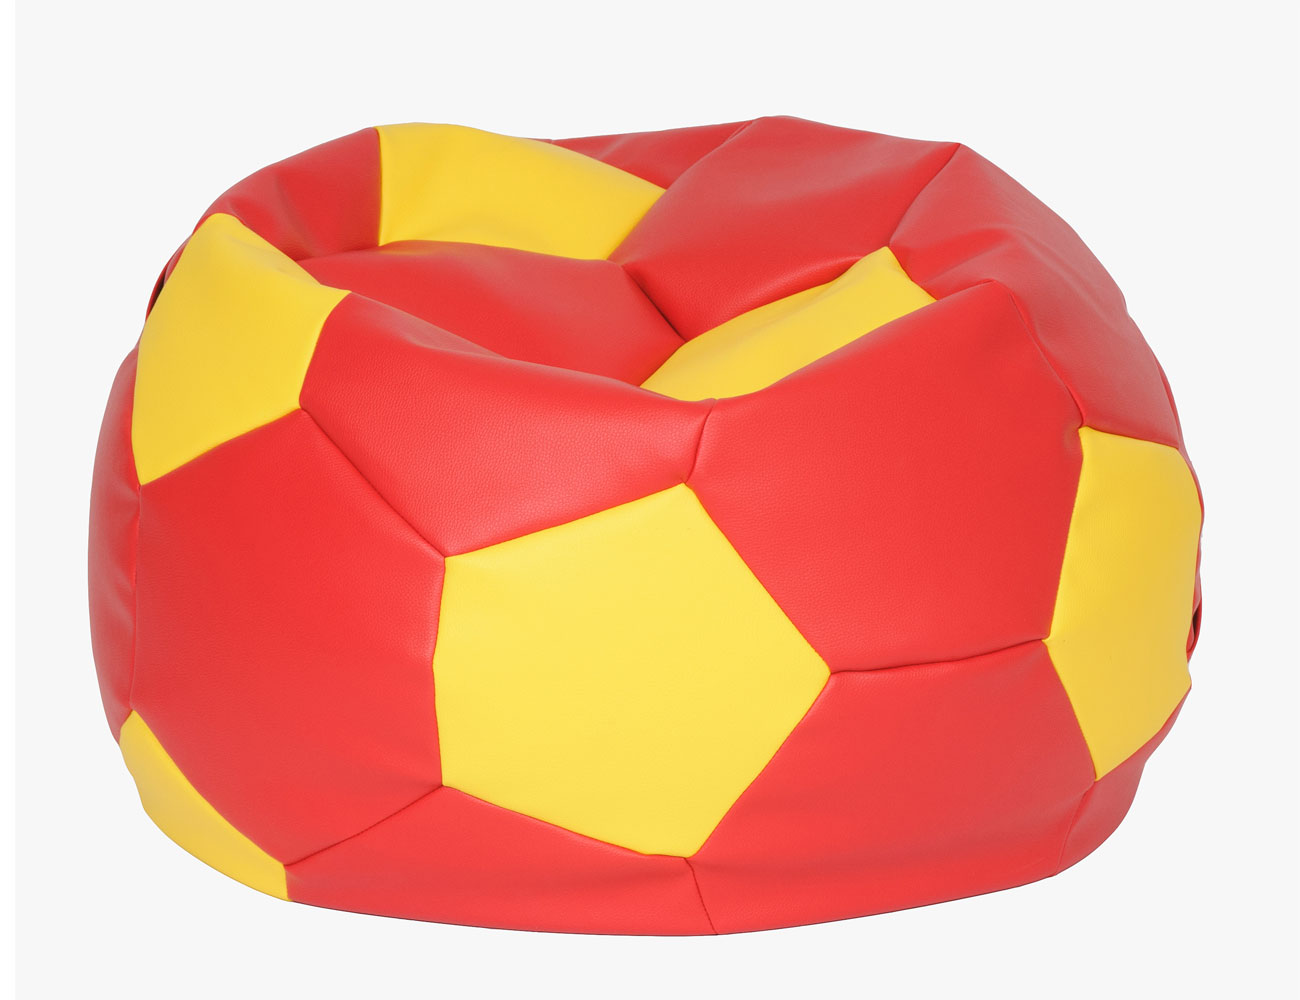 Puff pelota futbol roja amarilla